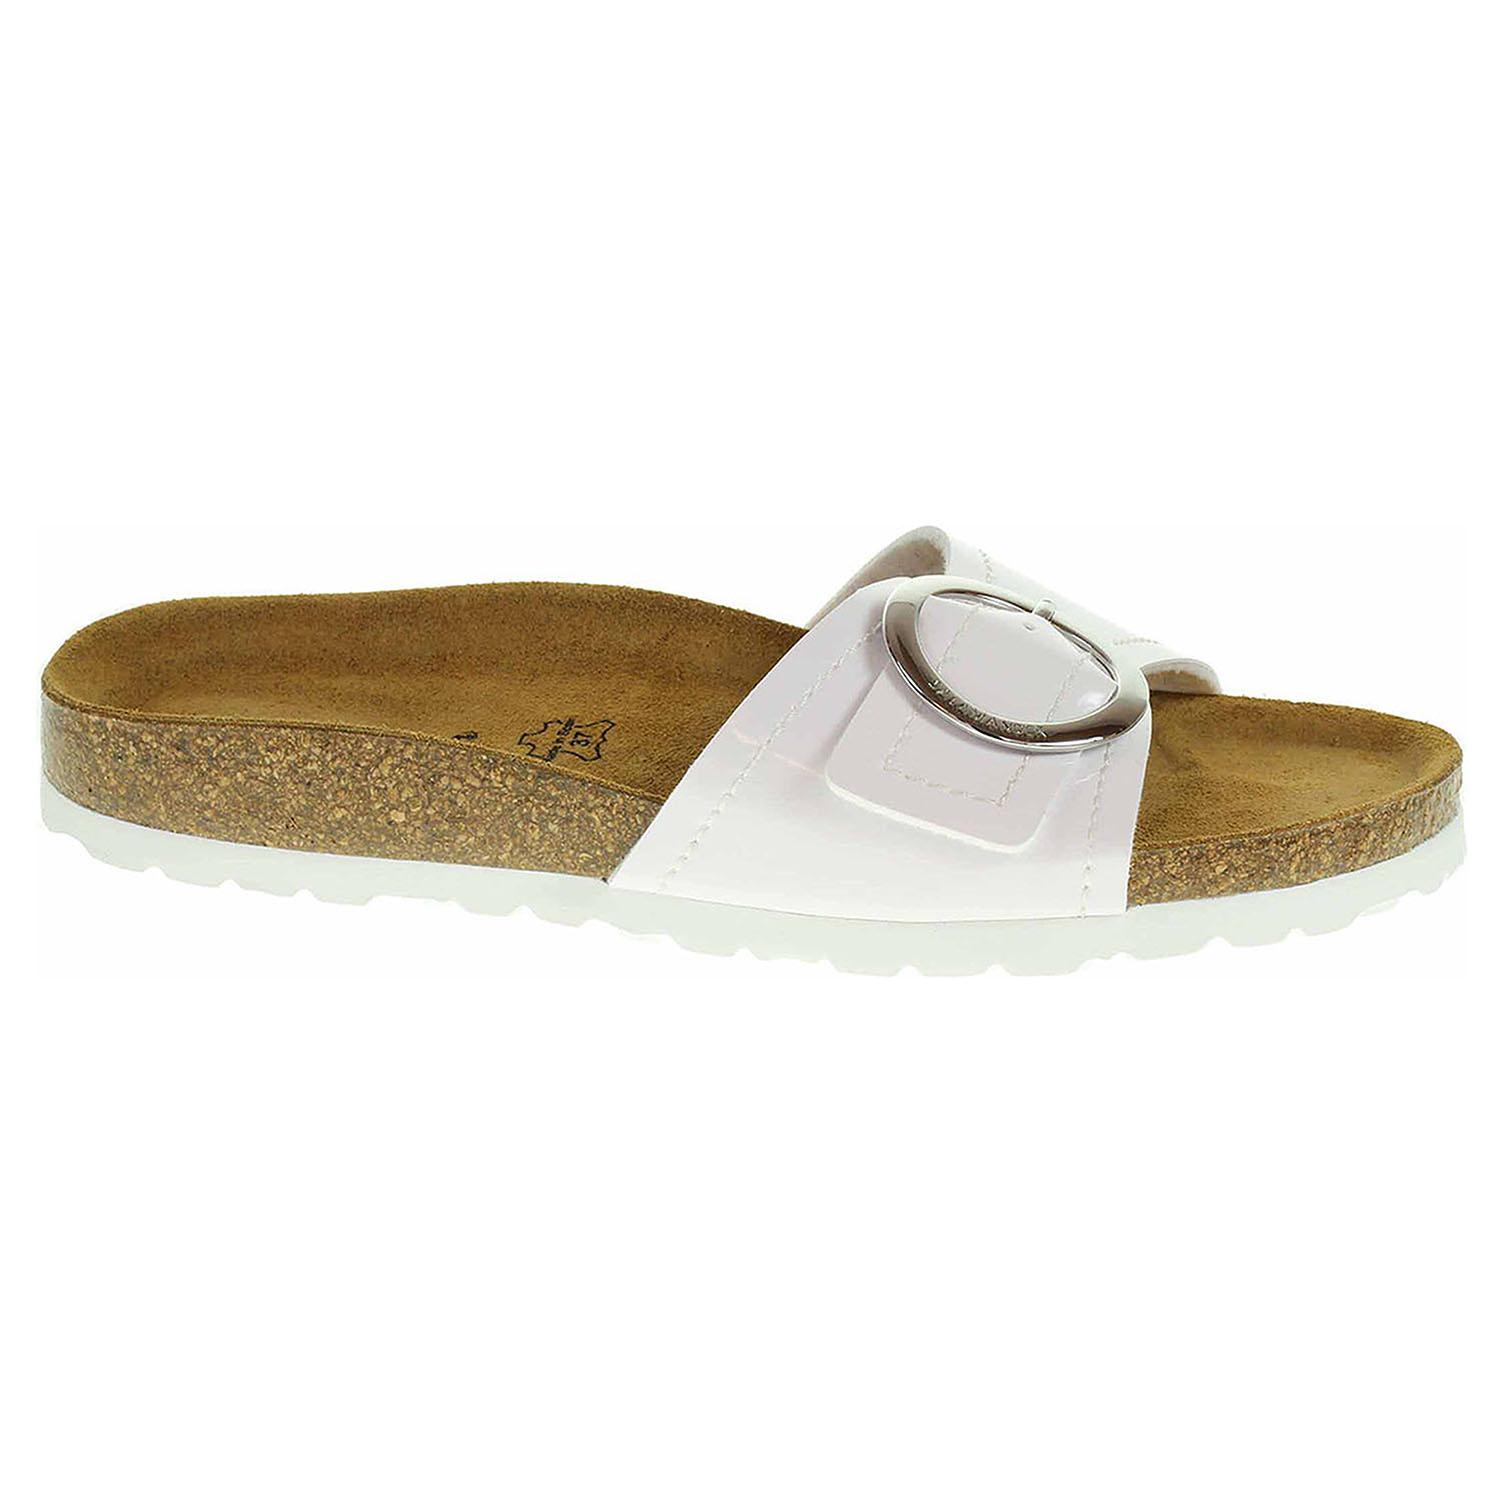 Dámské pantofle Salamander 32-13009-30 white 32-13009-30 37